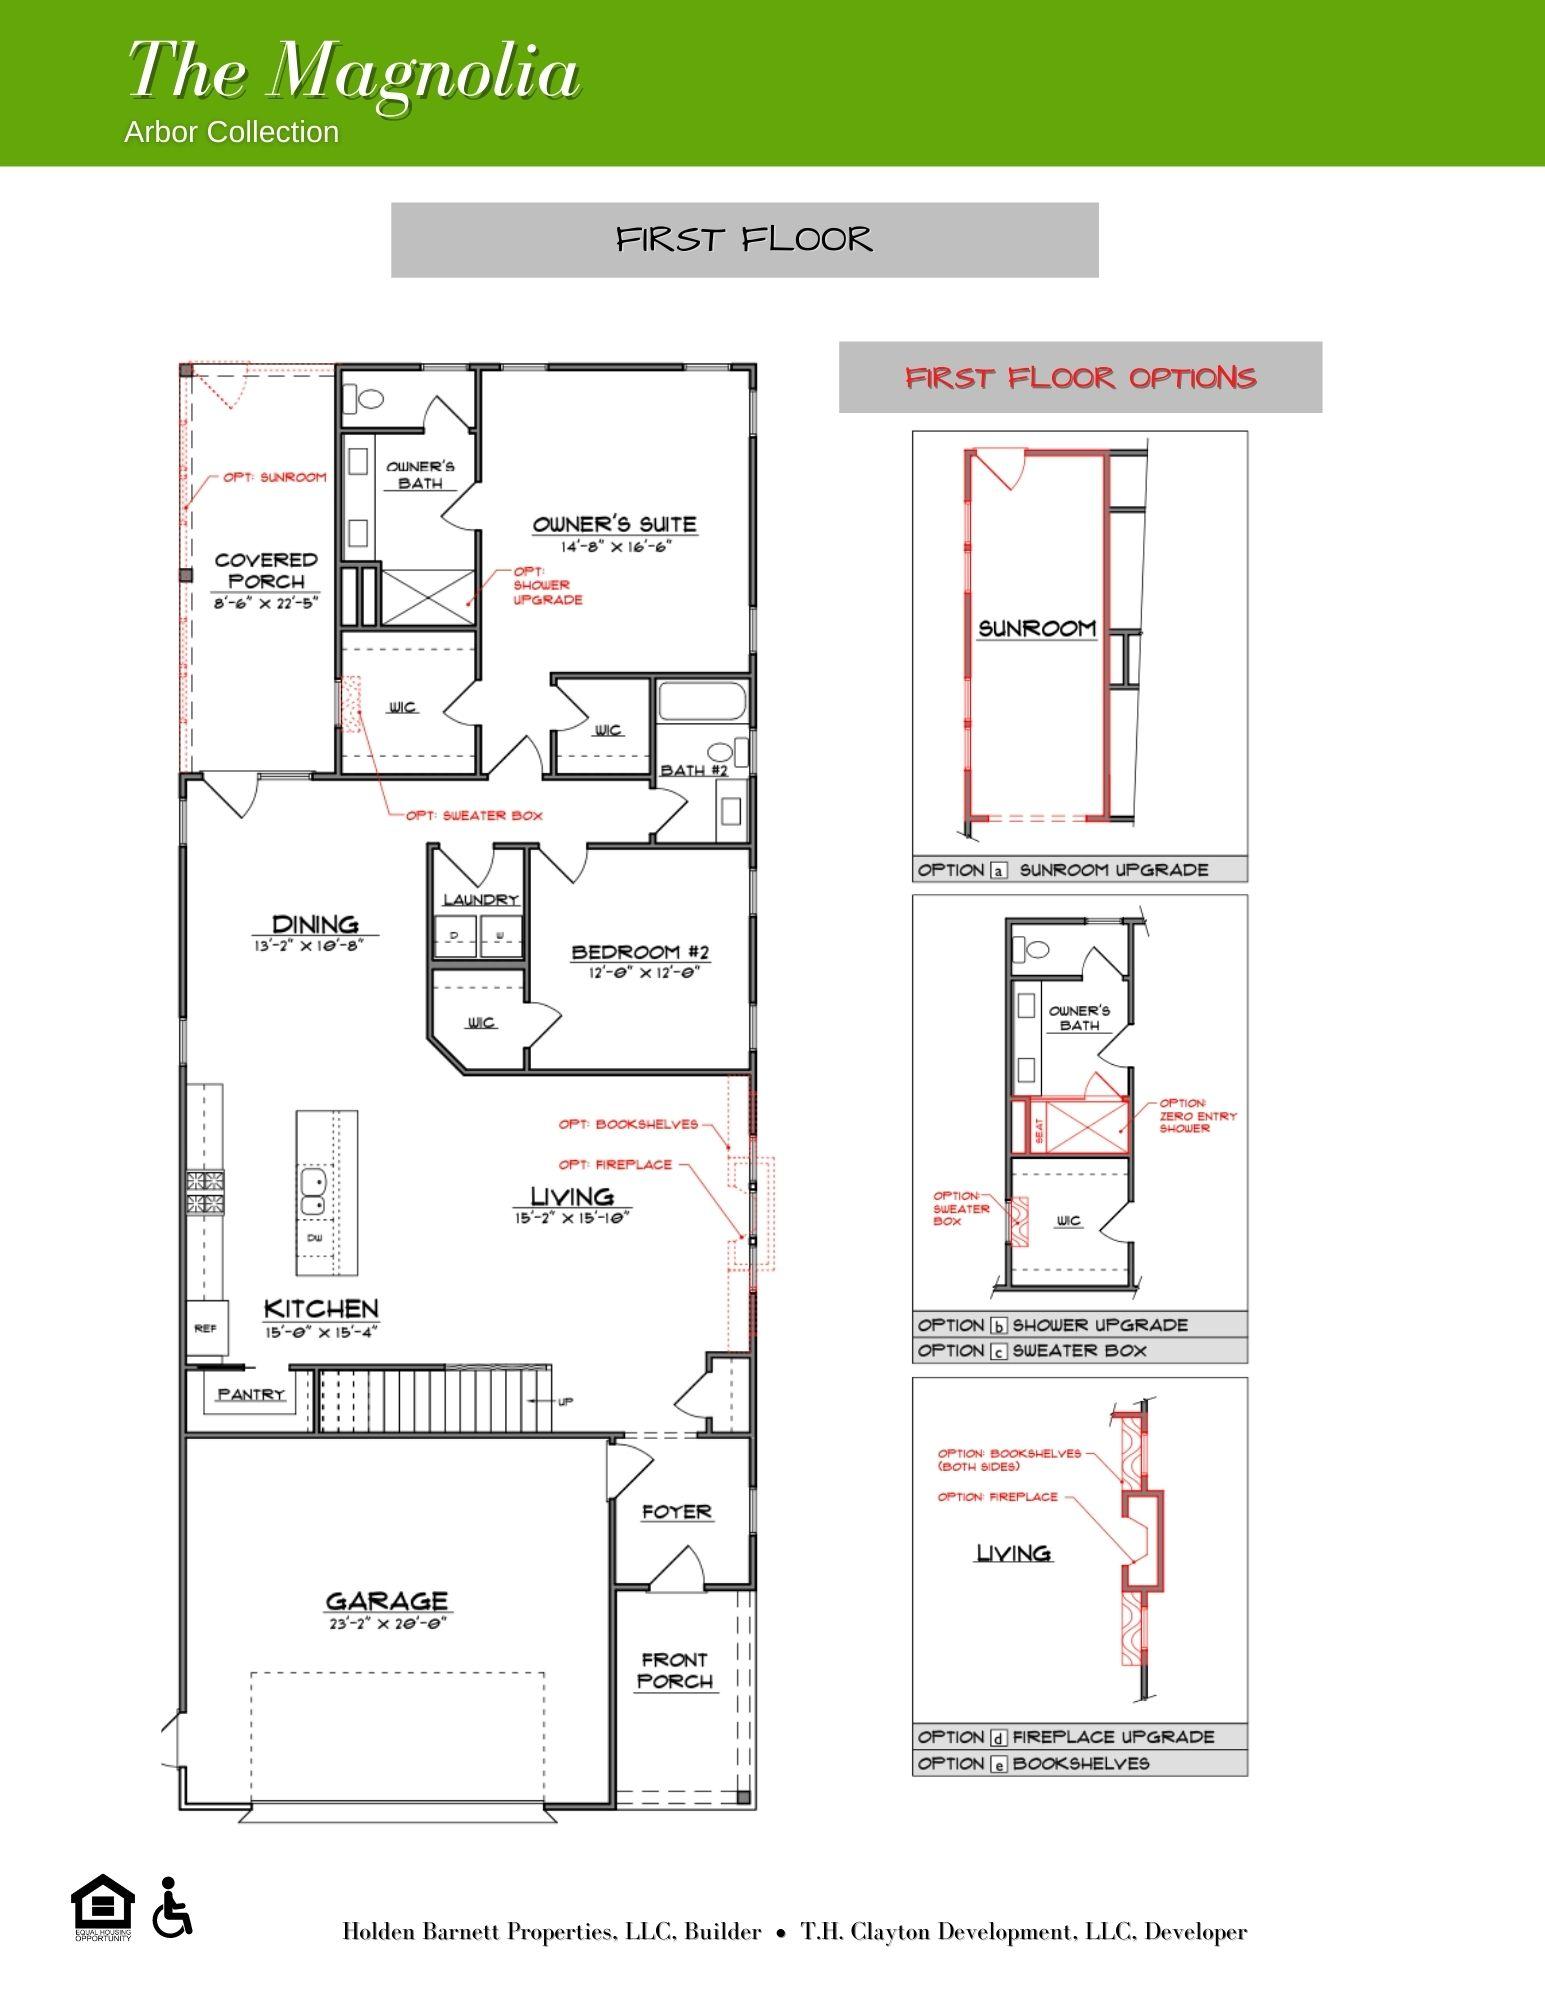 The Magnolia First Floor Floorplan Options